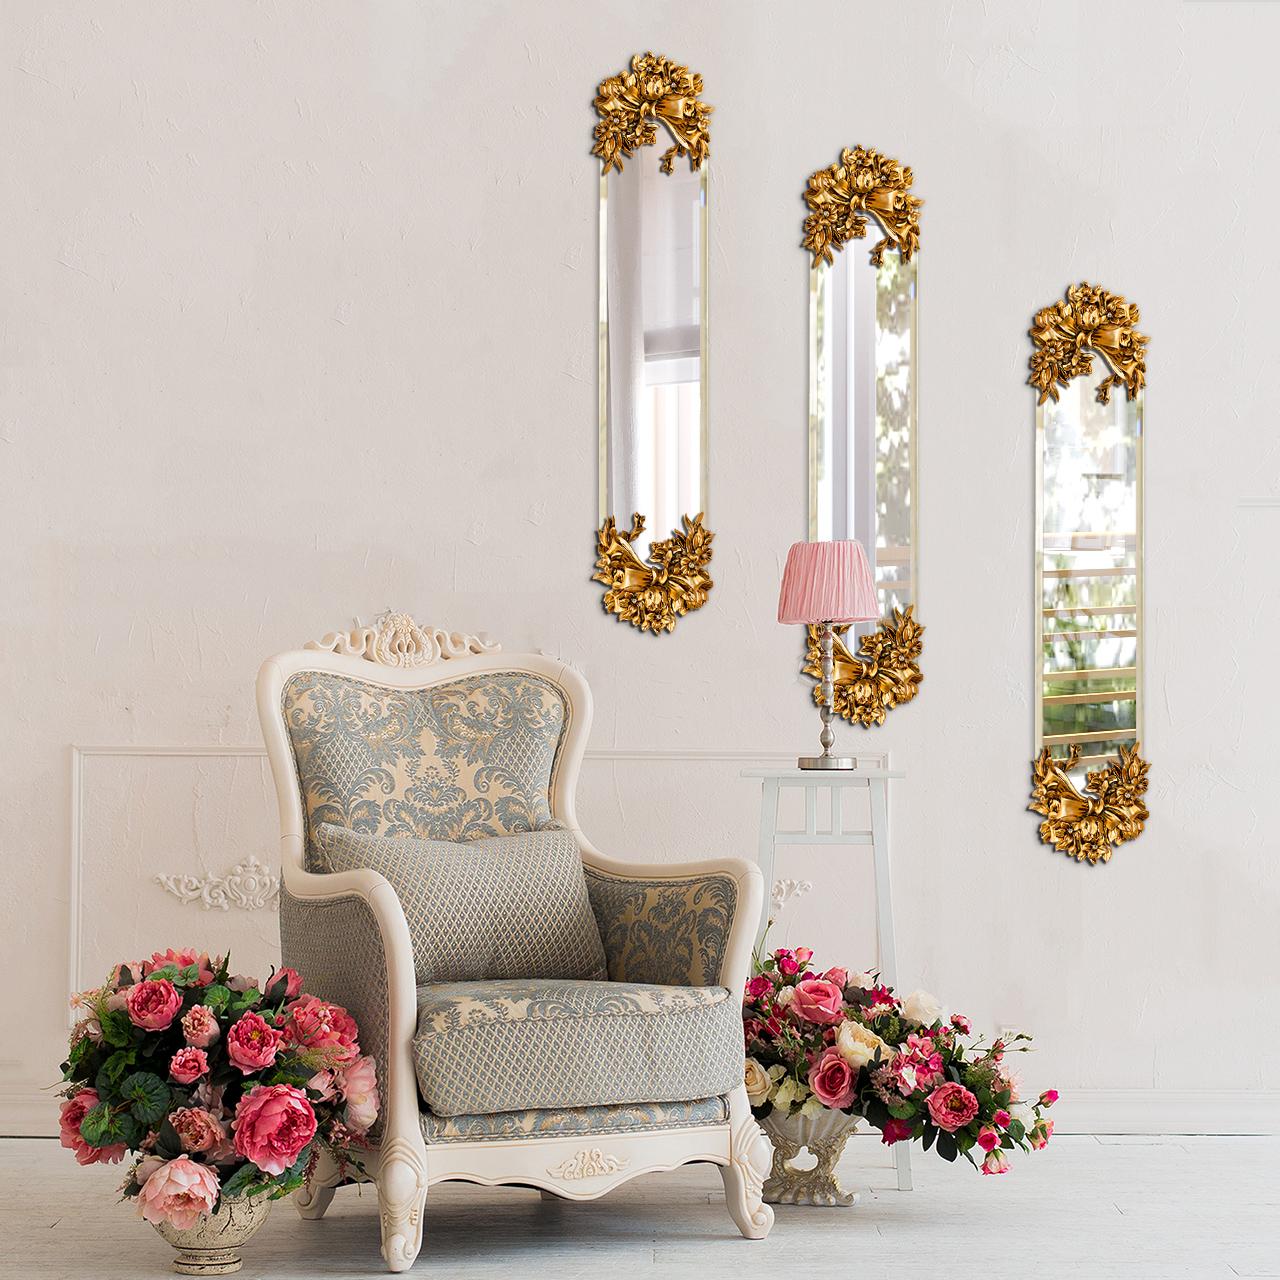 آینه پدیده شاپ طرح پاپیون طلایی مجموعه 3 عددی |